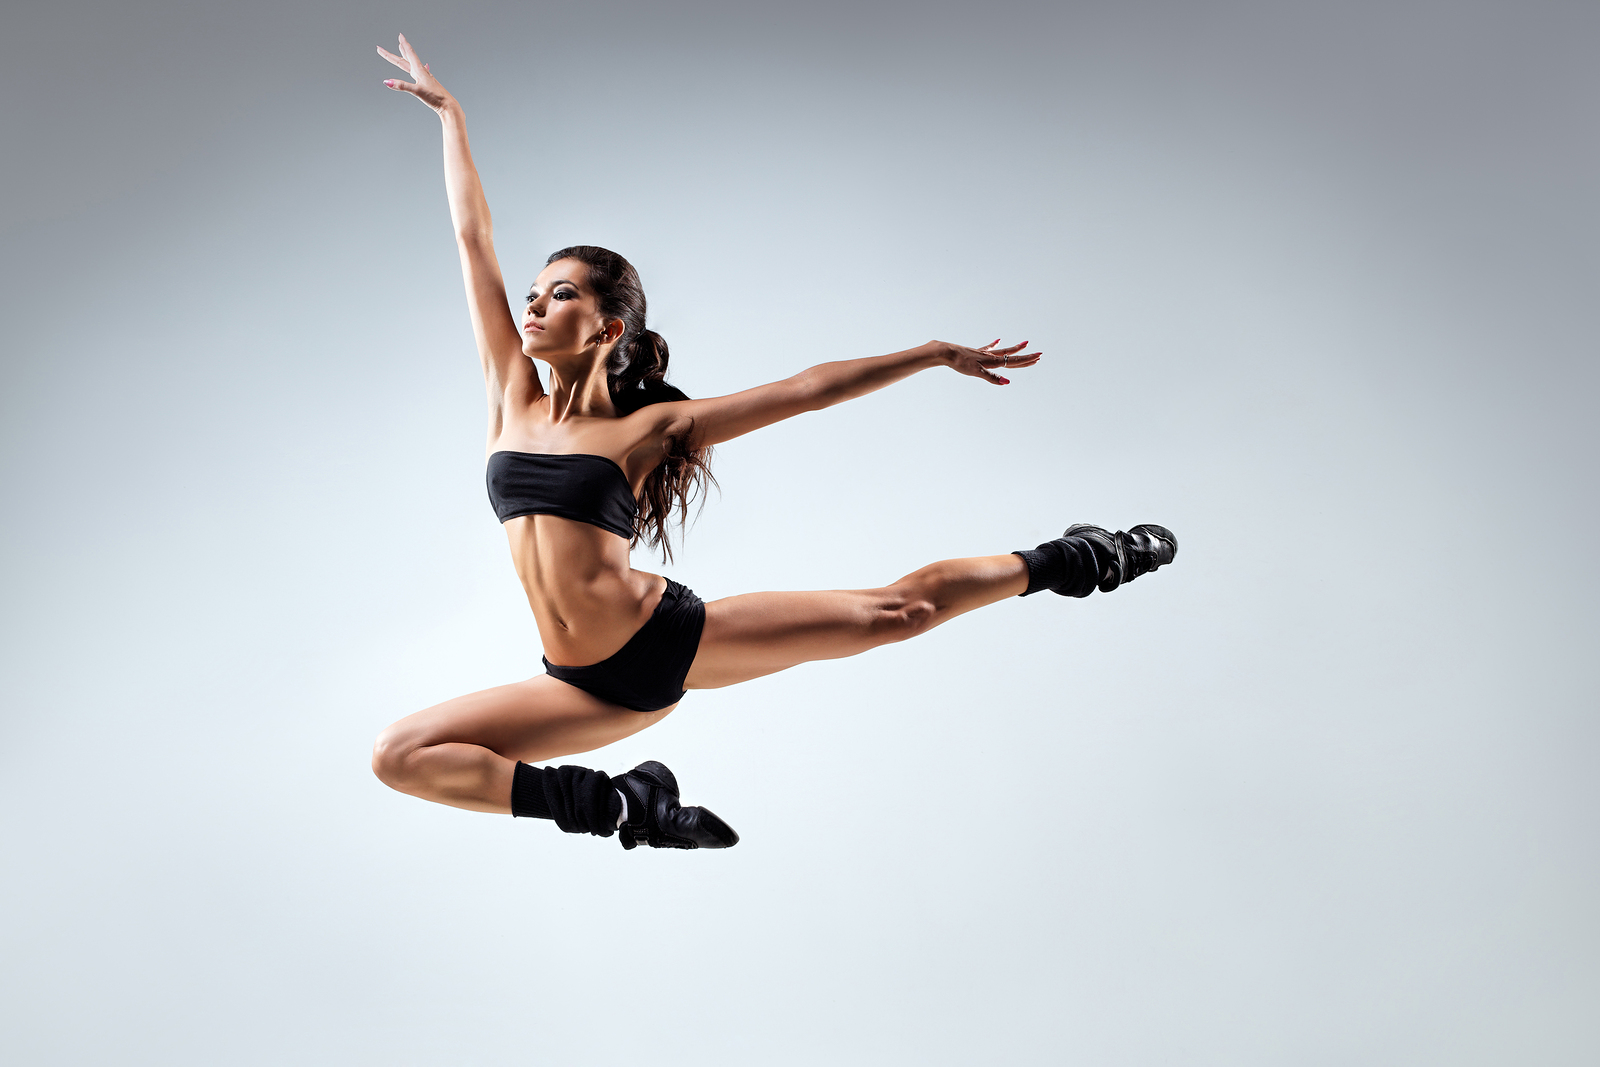 bigstock-young-and-beautiful-dancer-pos-22648748